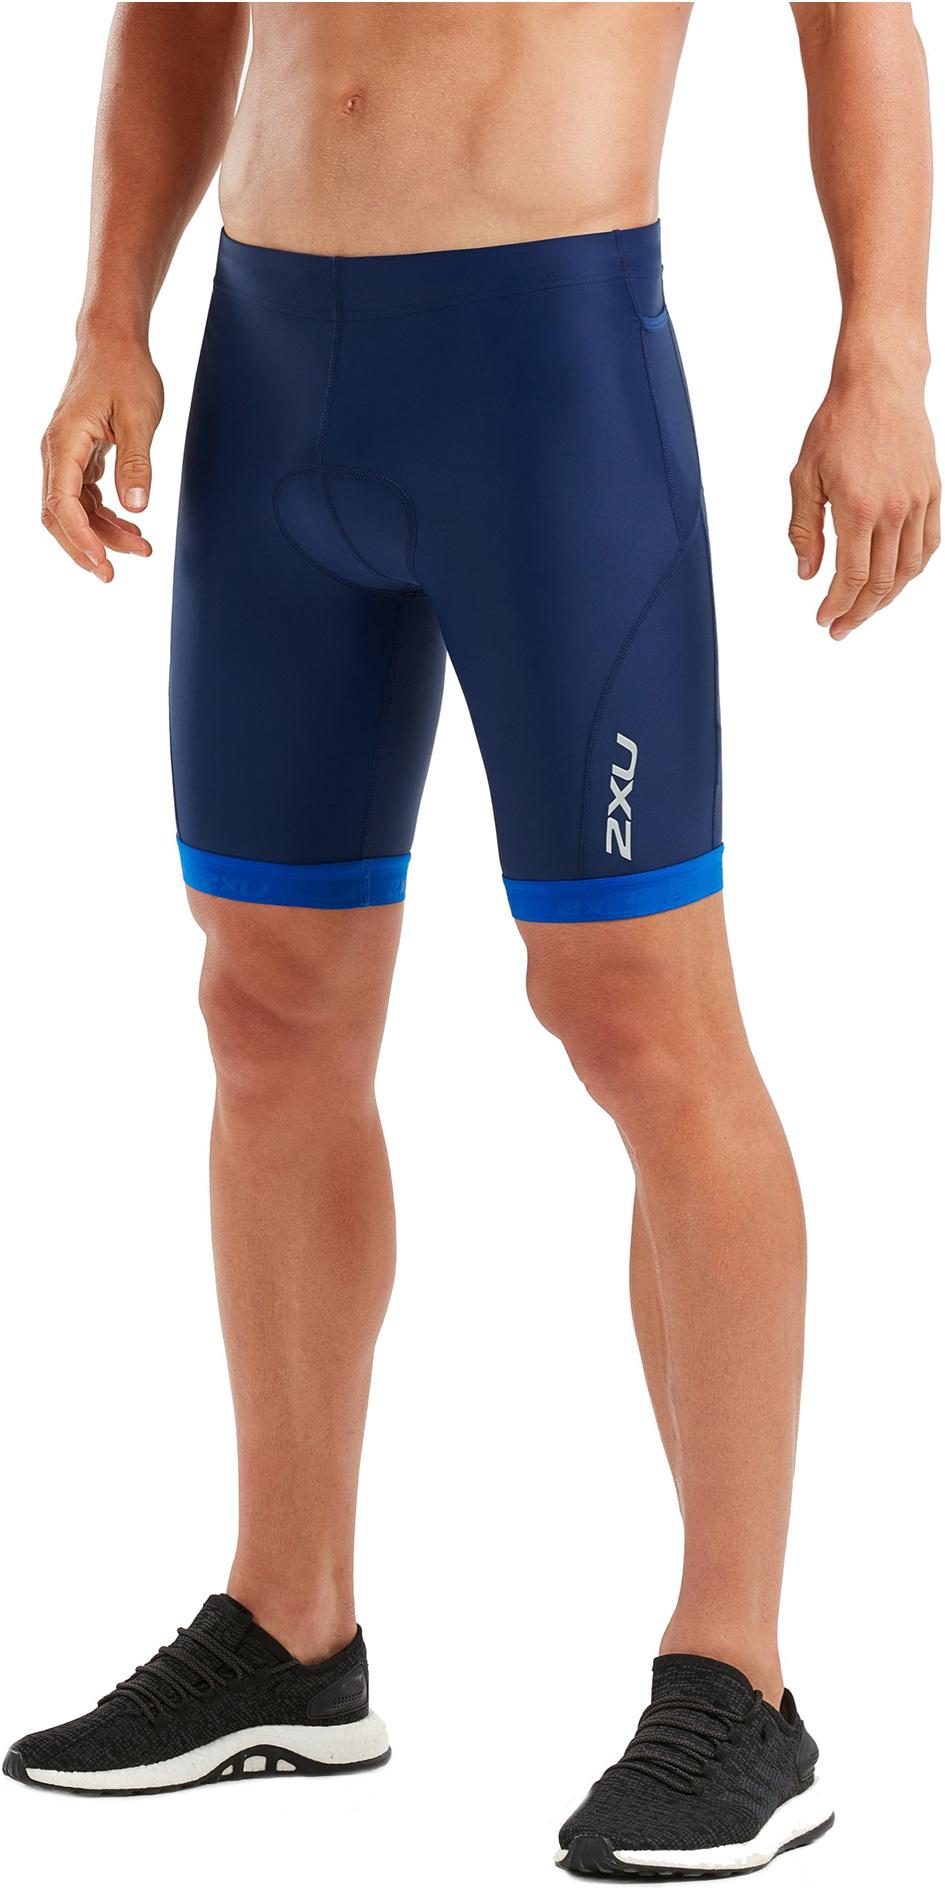 2019 2XU Mens Active Tri Shorts Navy / Lapis Blue Print MT4864b